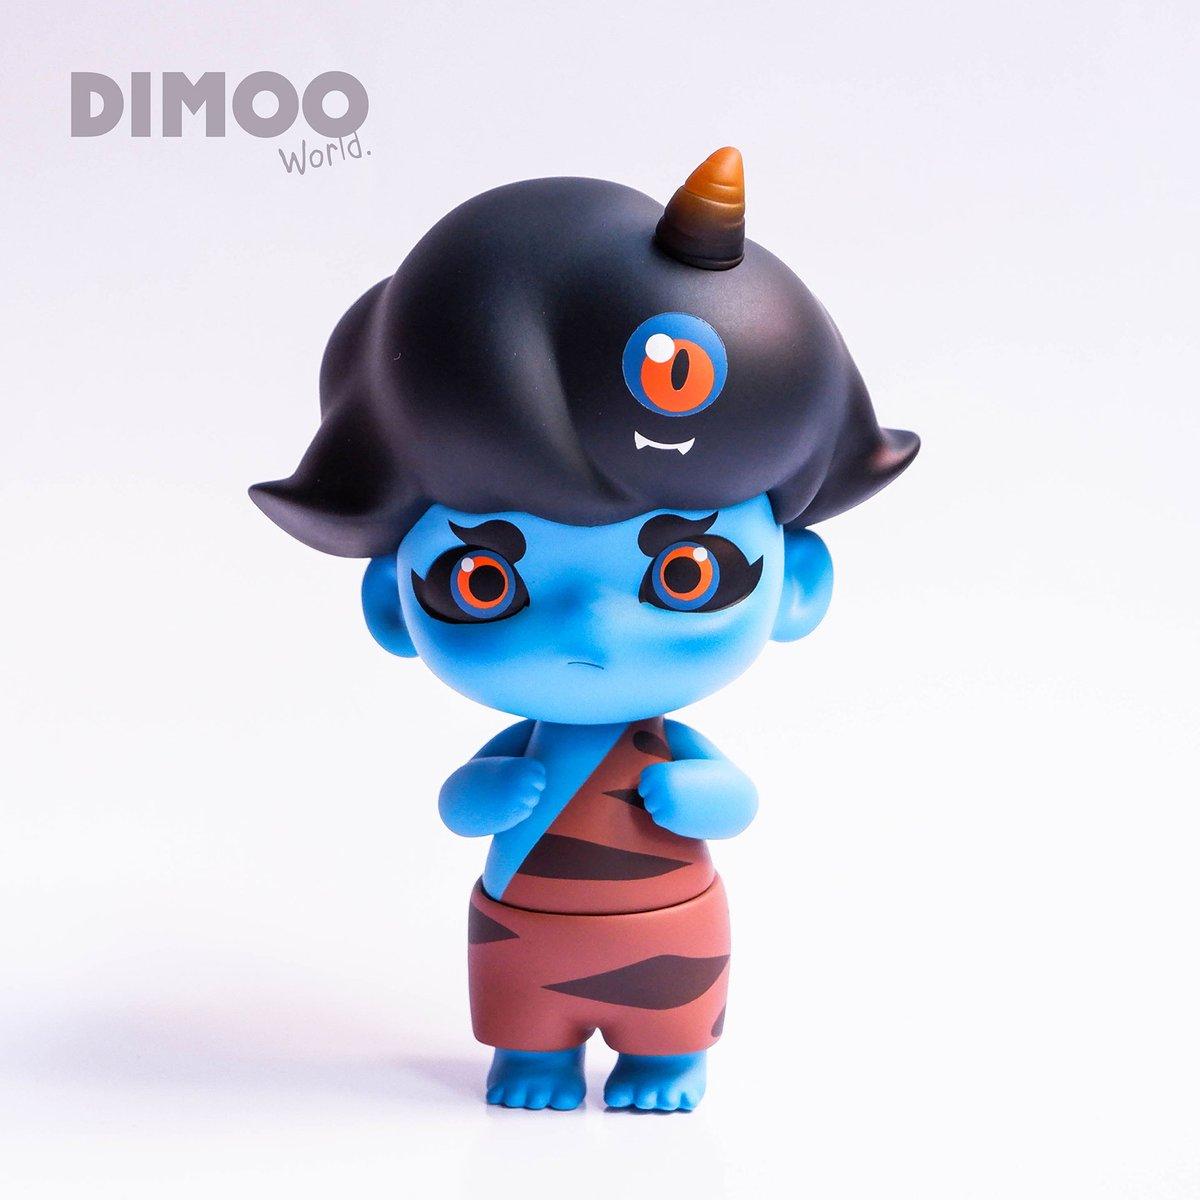 Got it! Dimoo Aooni ดิมูยักษ์ฟ้า Lotto TTE 2020 Exculsives #Dimoo #Aooni #DimooAooni #DIMOOWORLD #TTE2020 #Thailandtoyexpo #Thailandtoyexpo2020 ✨✨✨ https://t.co/yLAfj7MvhZ